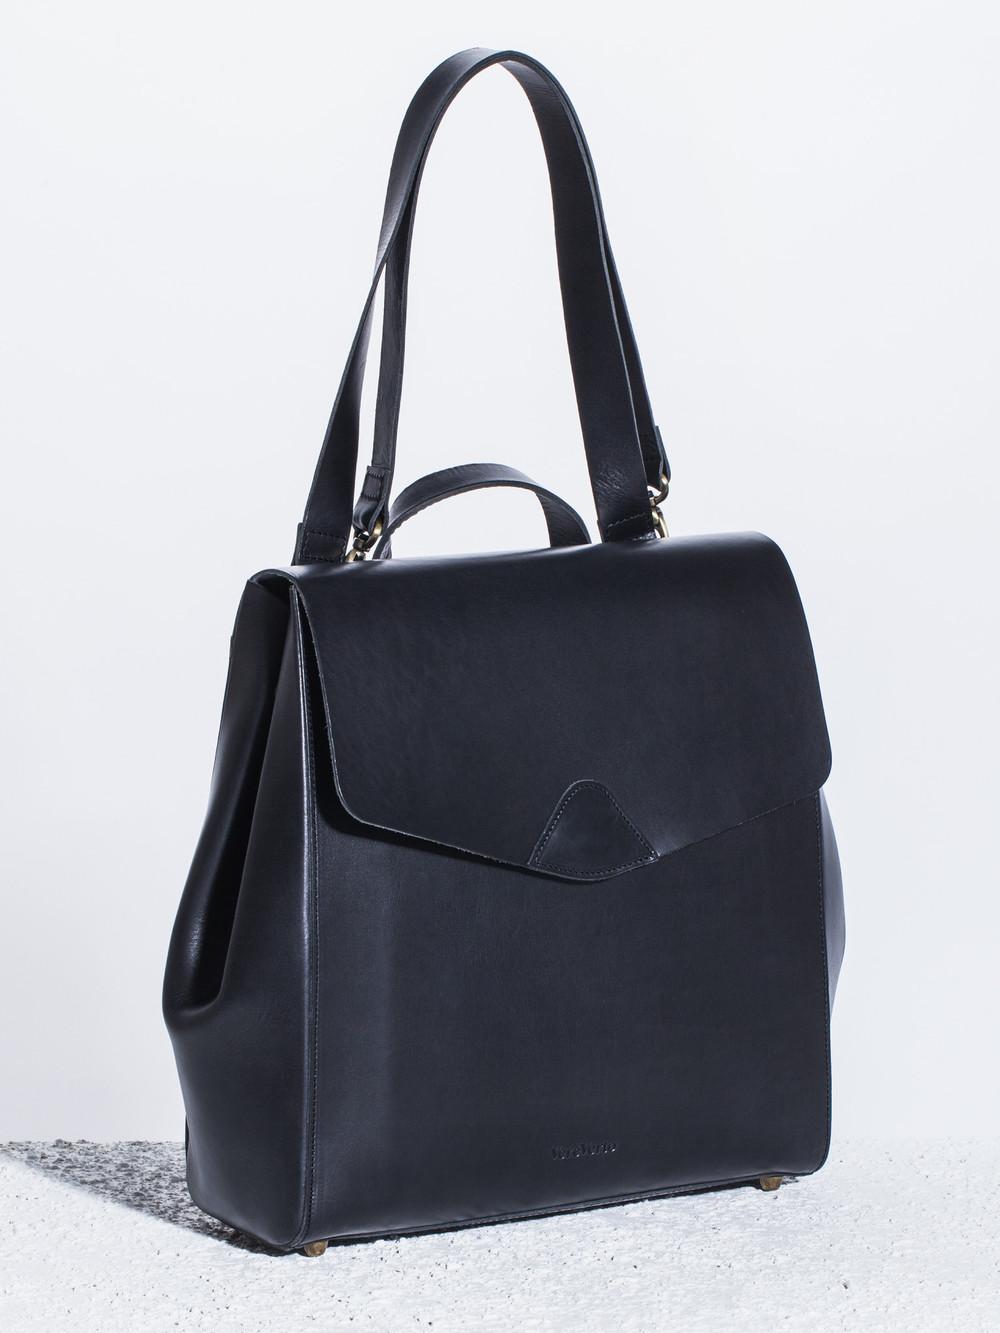 Vere-Verto-Macta-Backpack-Black-Angle-The-Drive-New-York.jpg